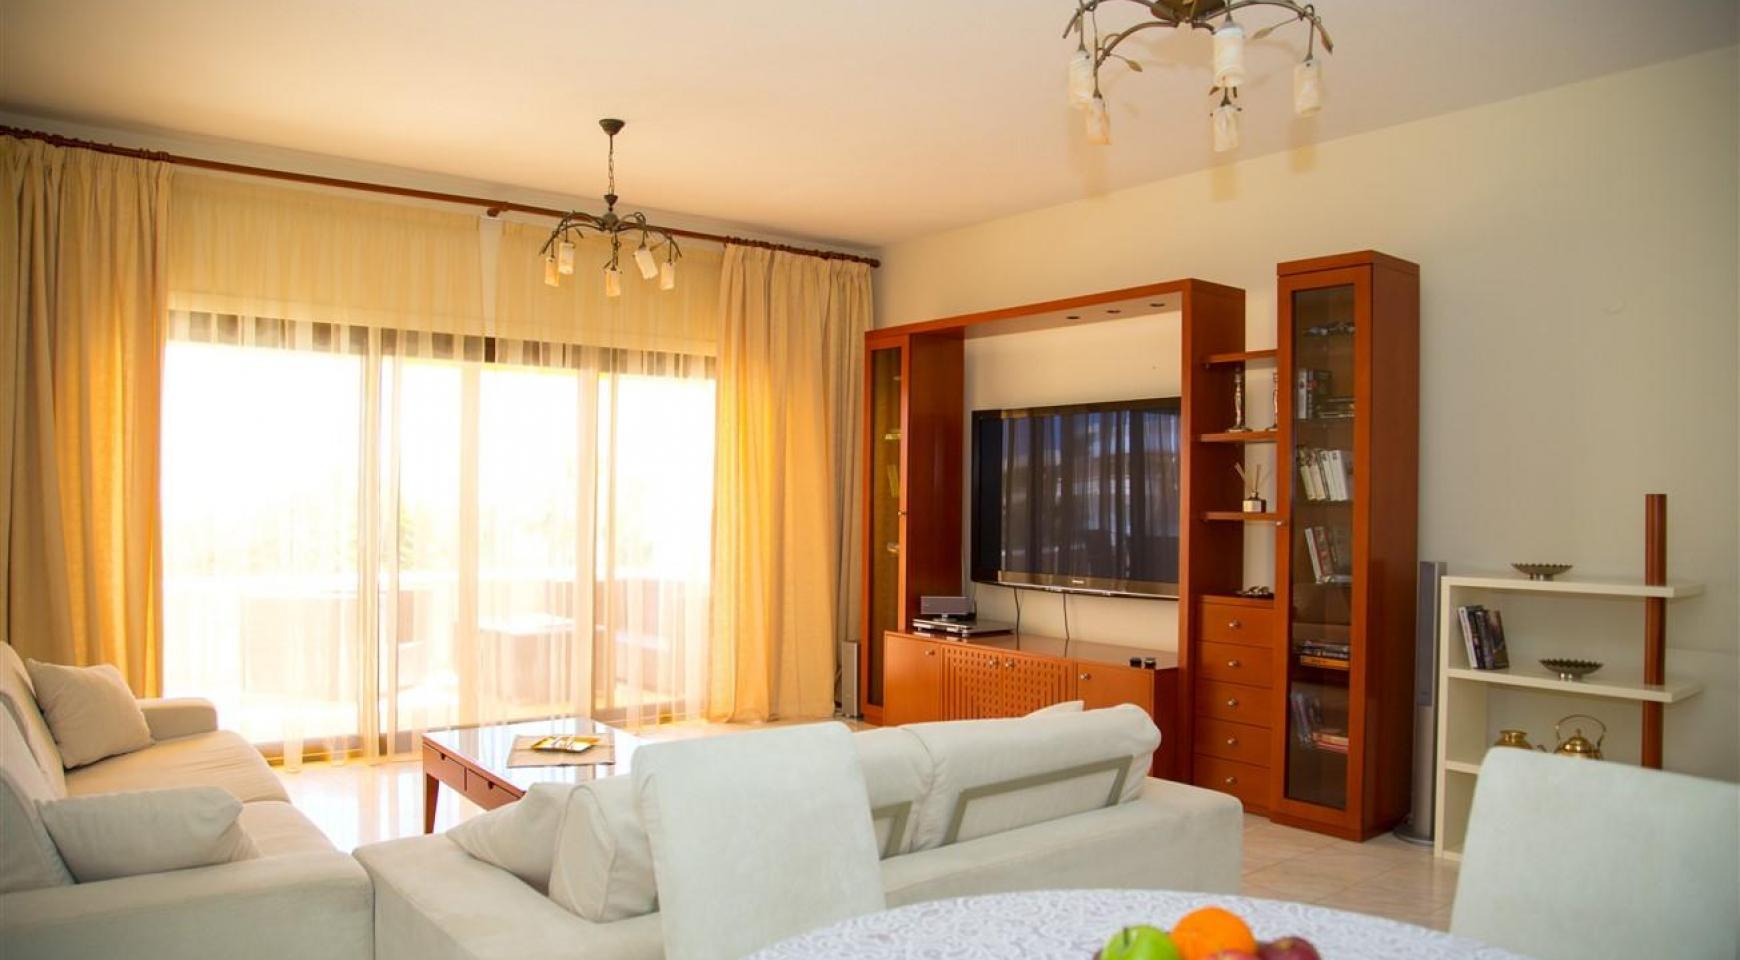 3-Спальная Квартира на Берегу Моря в Комплексе Thera   - 18